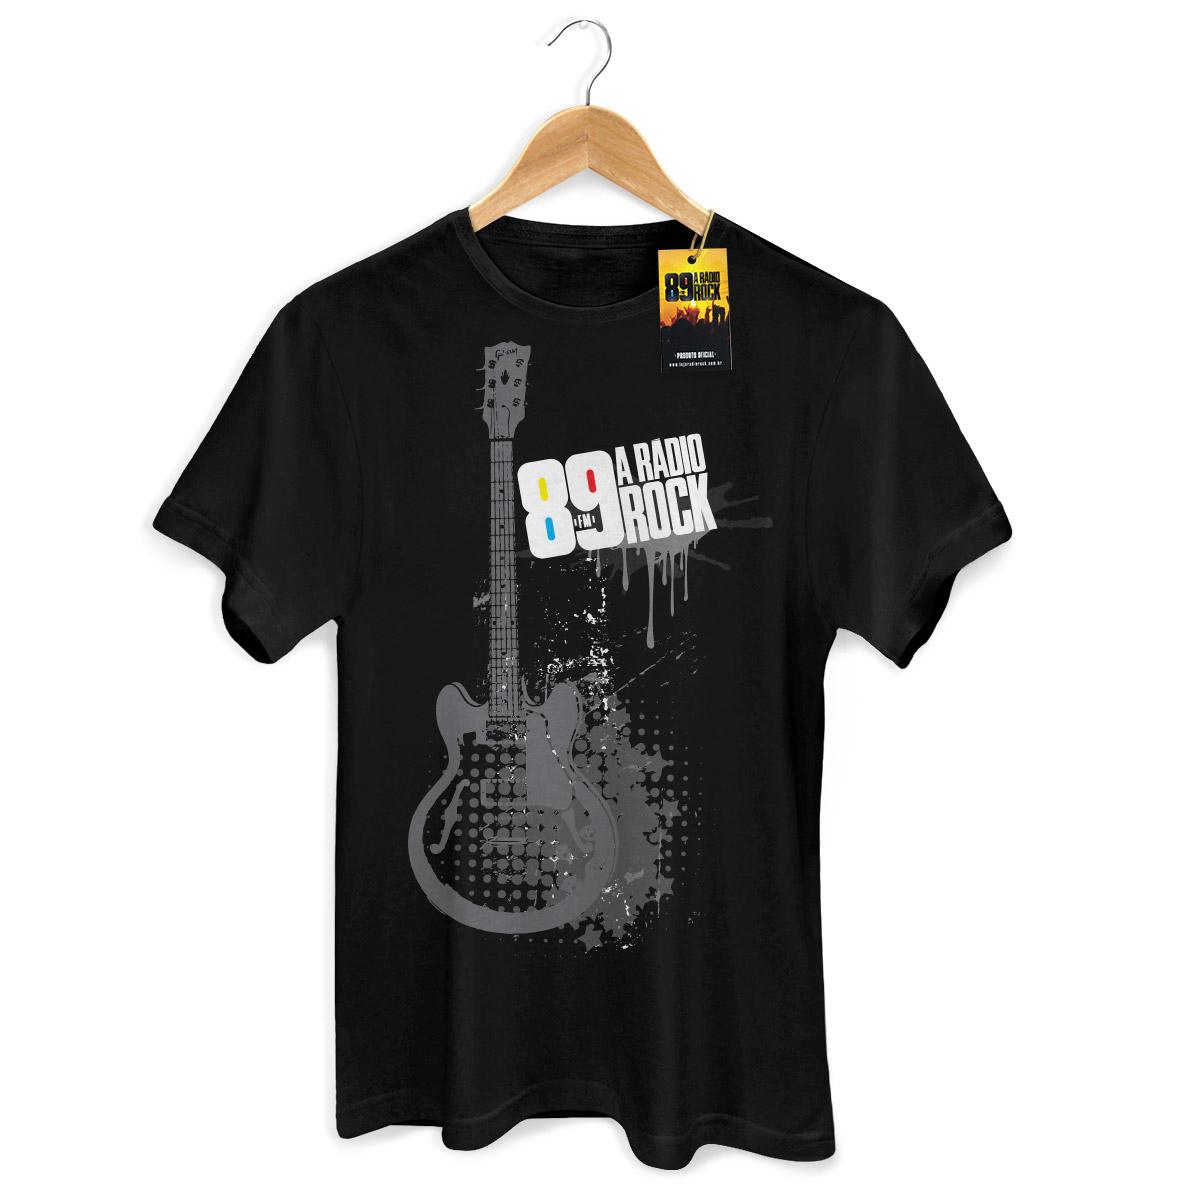 Camiseta Masculina 89 FM - Guitar